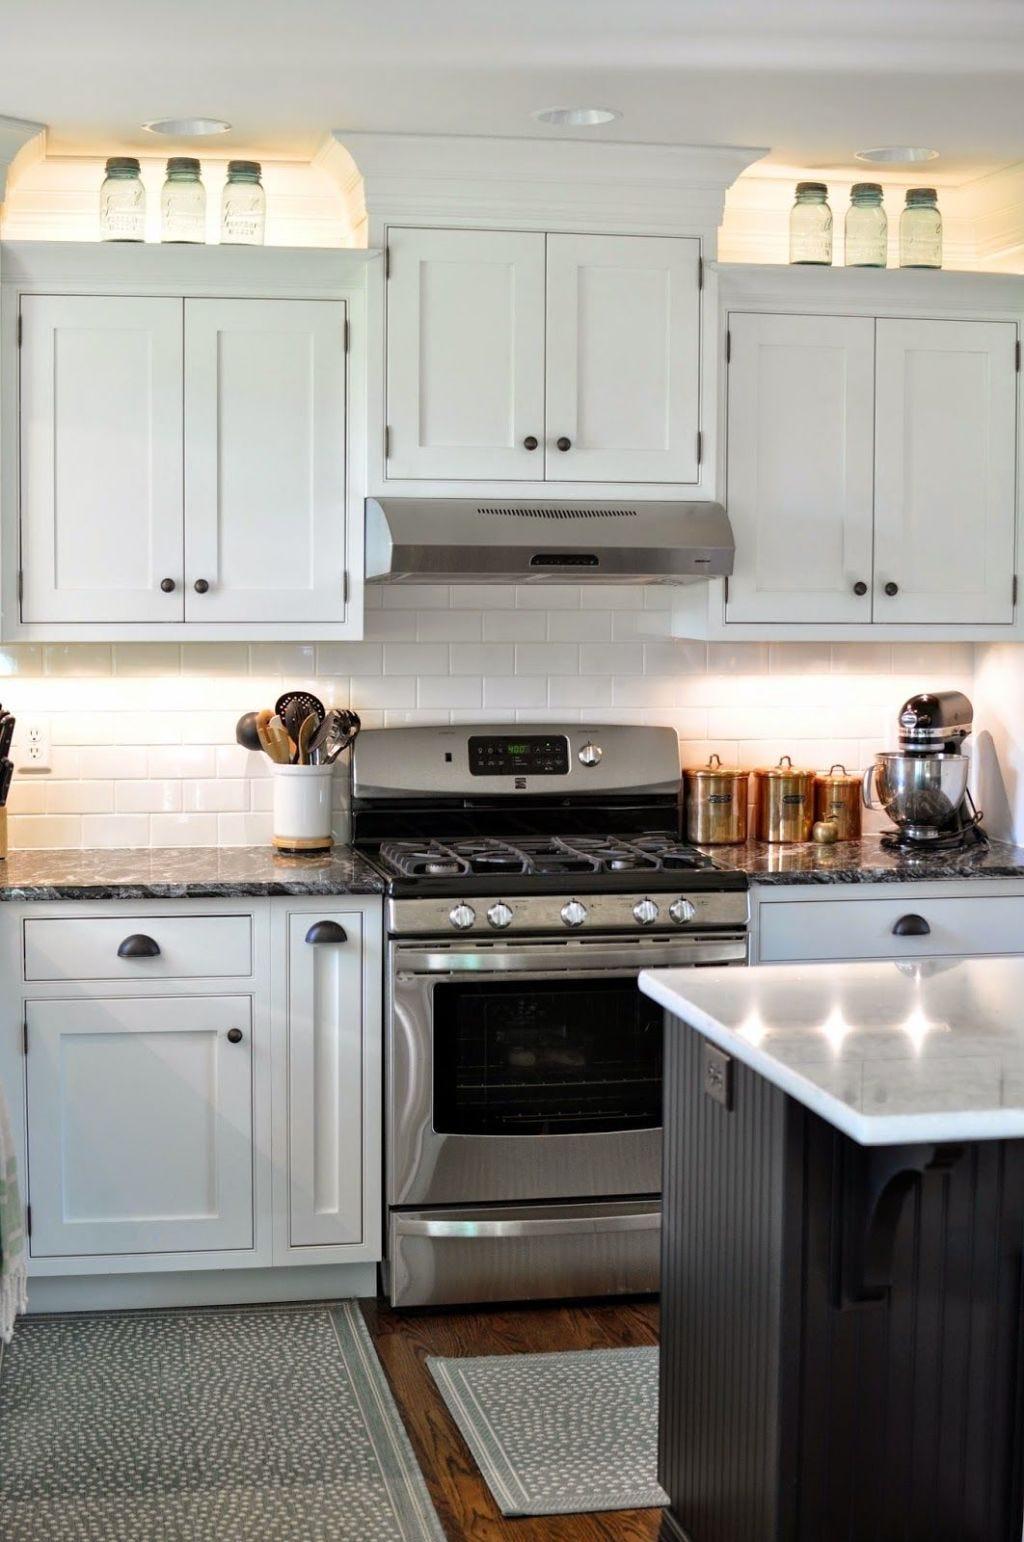 Room, Major appliance, White, Kitchen, Home appliance, Stove, Floor, Kitchen stove, Kitchen appliance, Cabinetry,